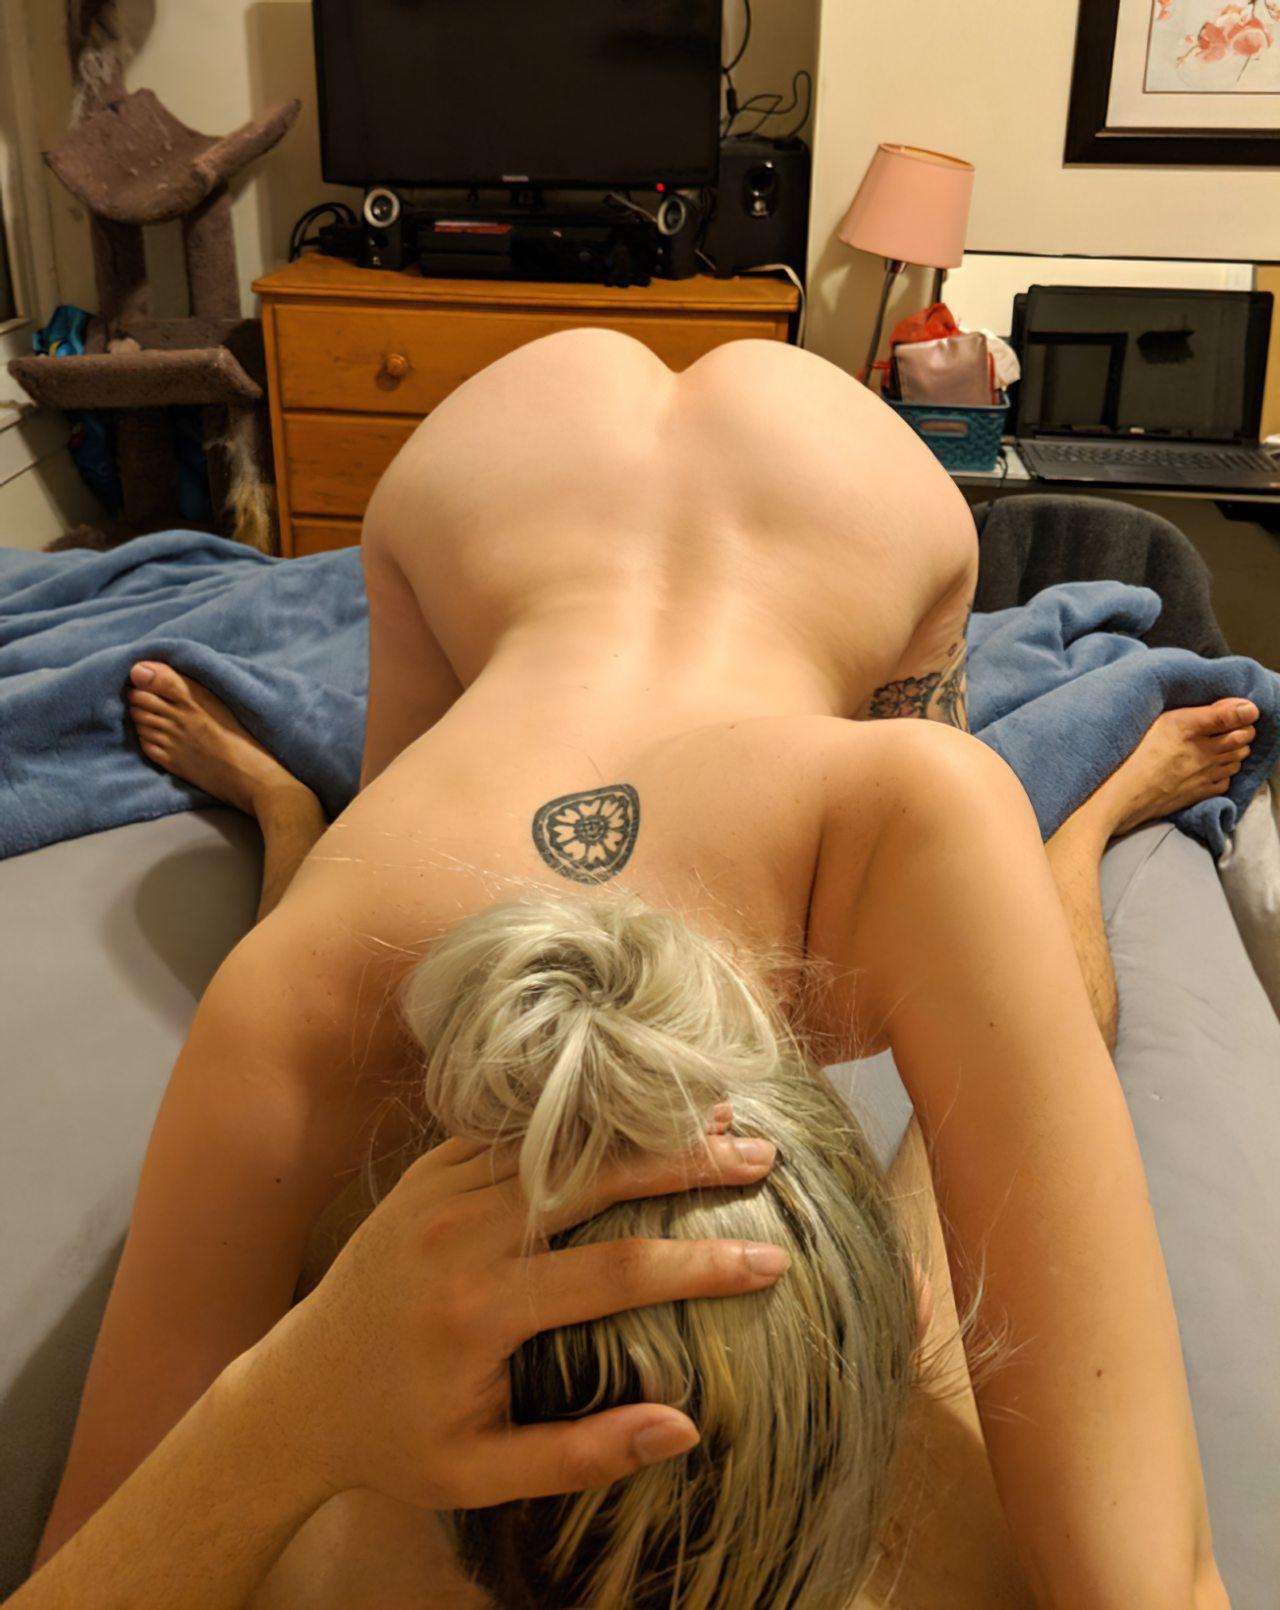 Fotos Sexo Nudes Loira Anonima (5)